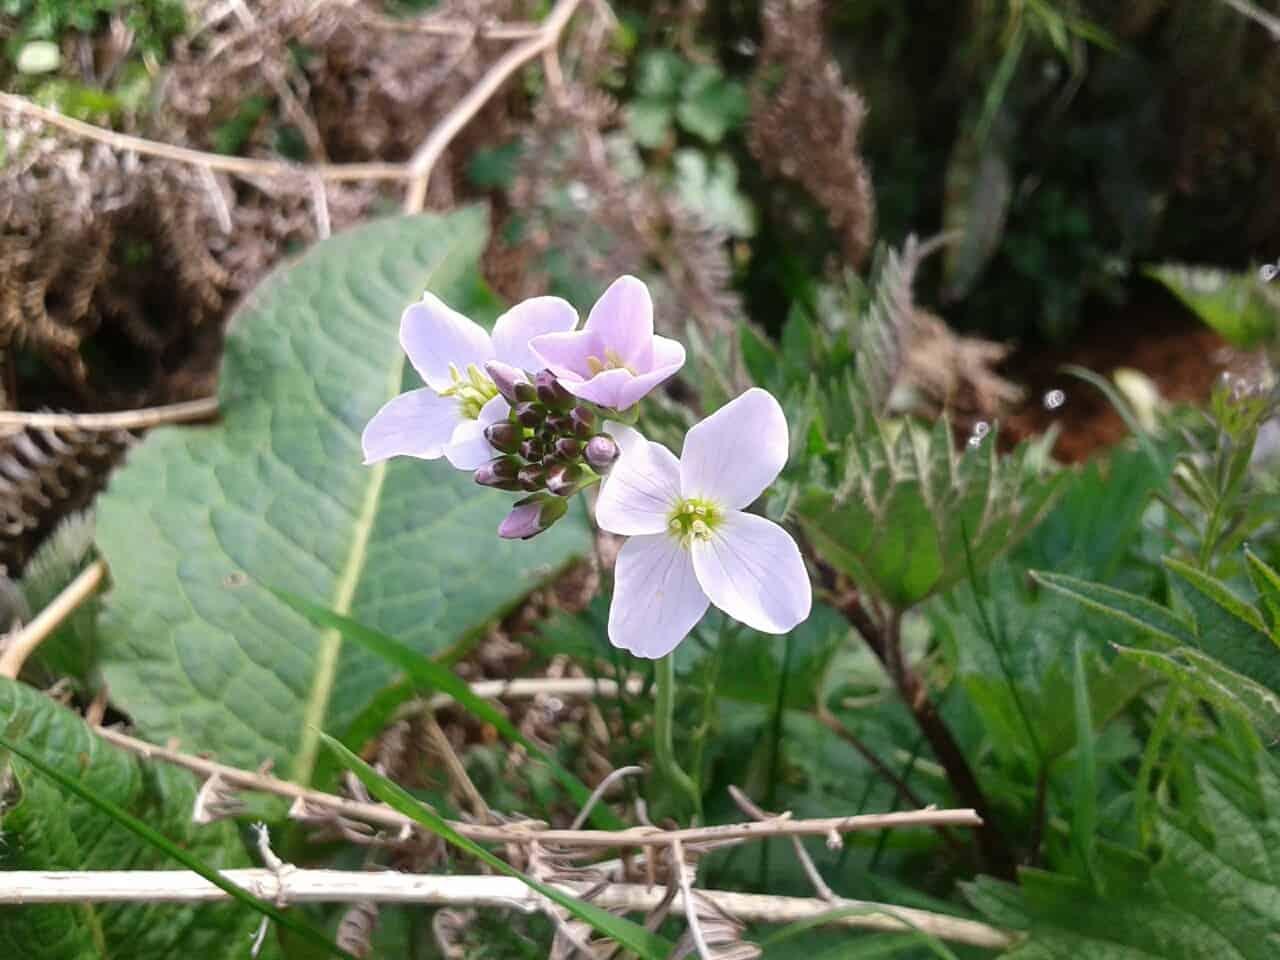 Cuckoo flower or Ladys Smock